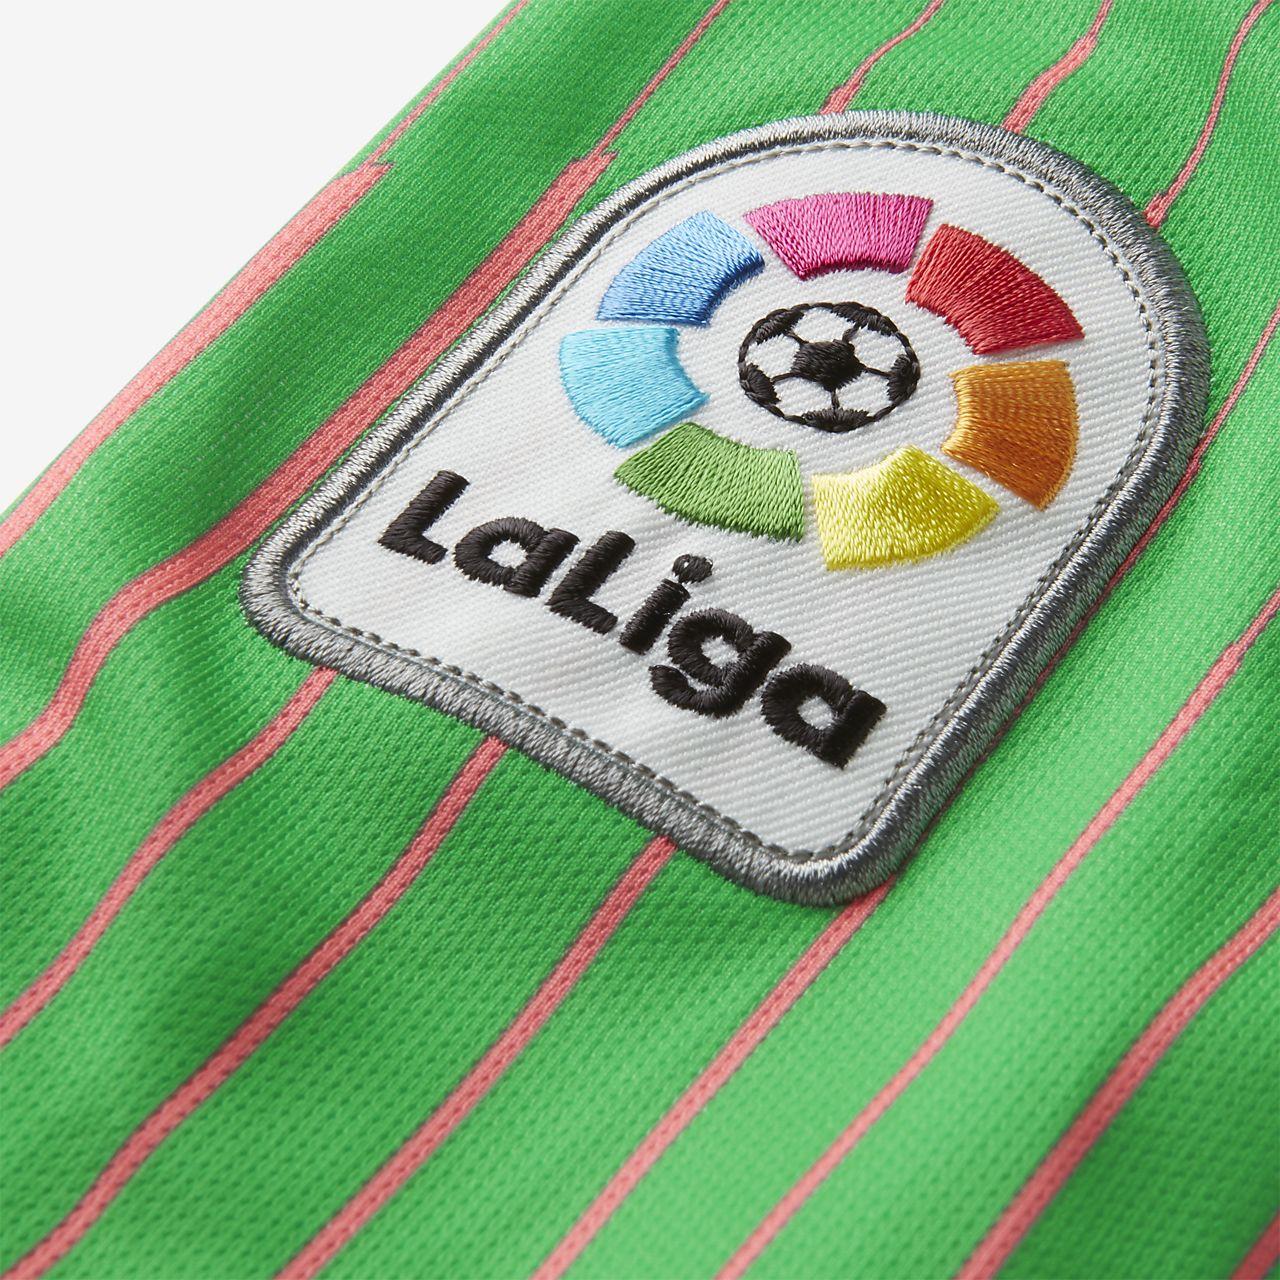 bf031da5f8fd0 2018 19 FC Barcelona Stadium Goalkeeper Camiseta de fútbol - Hombre ...